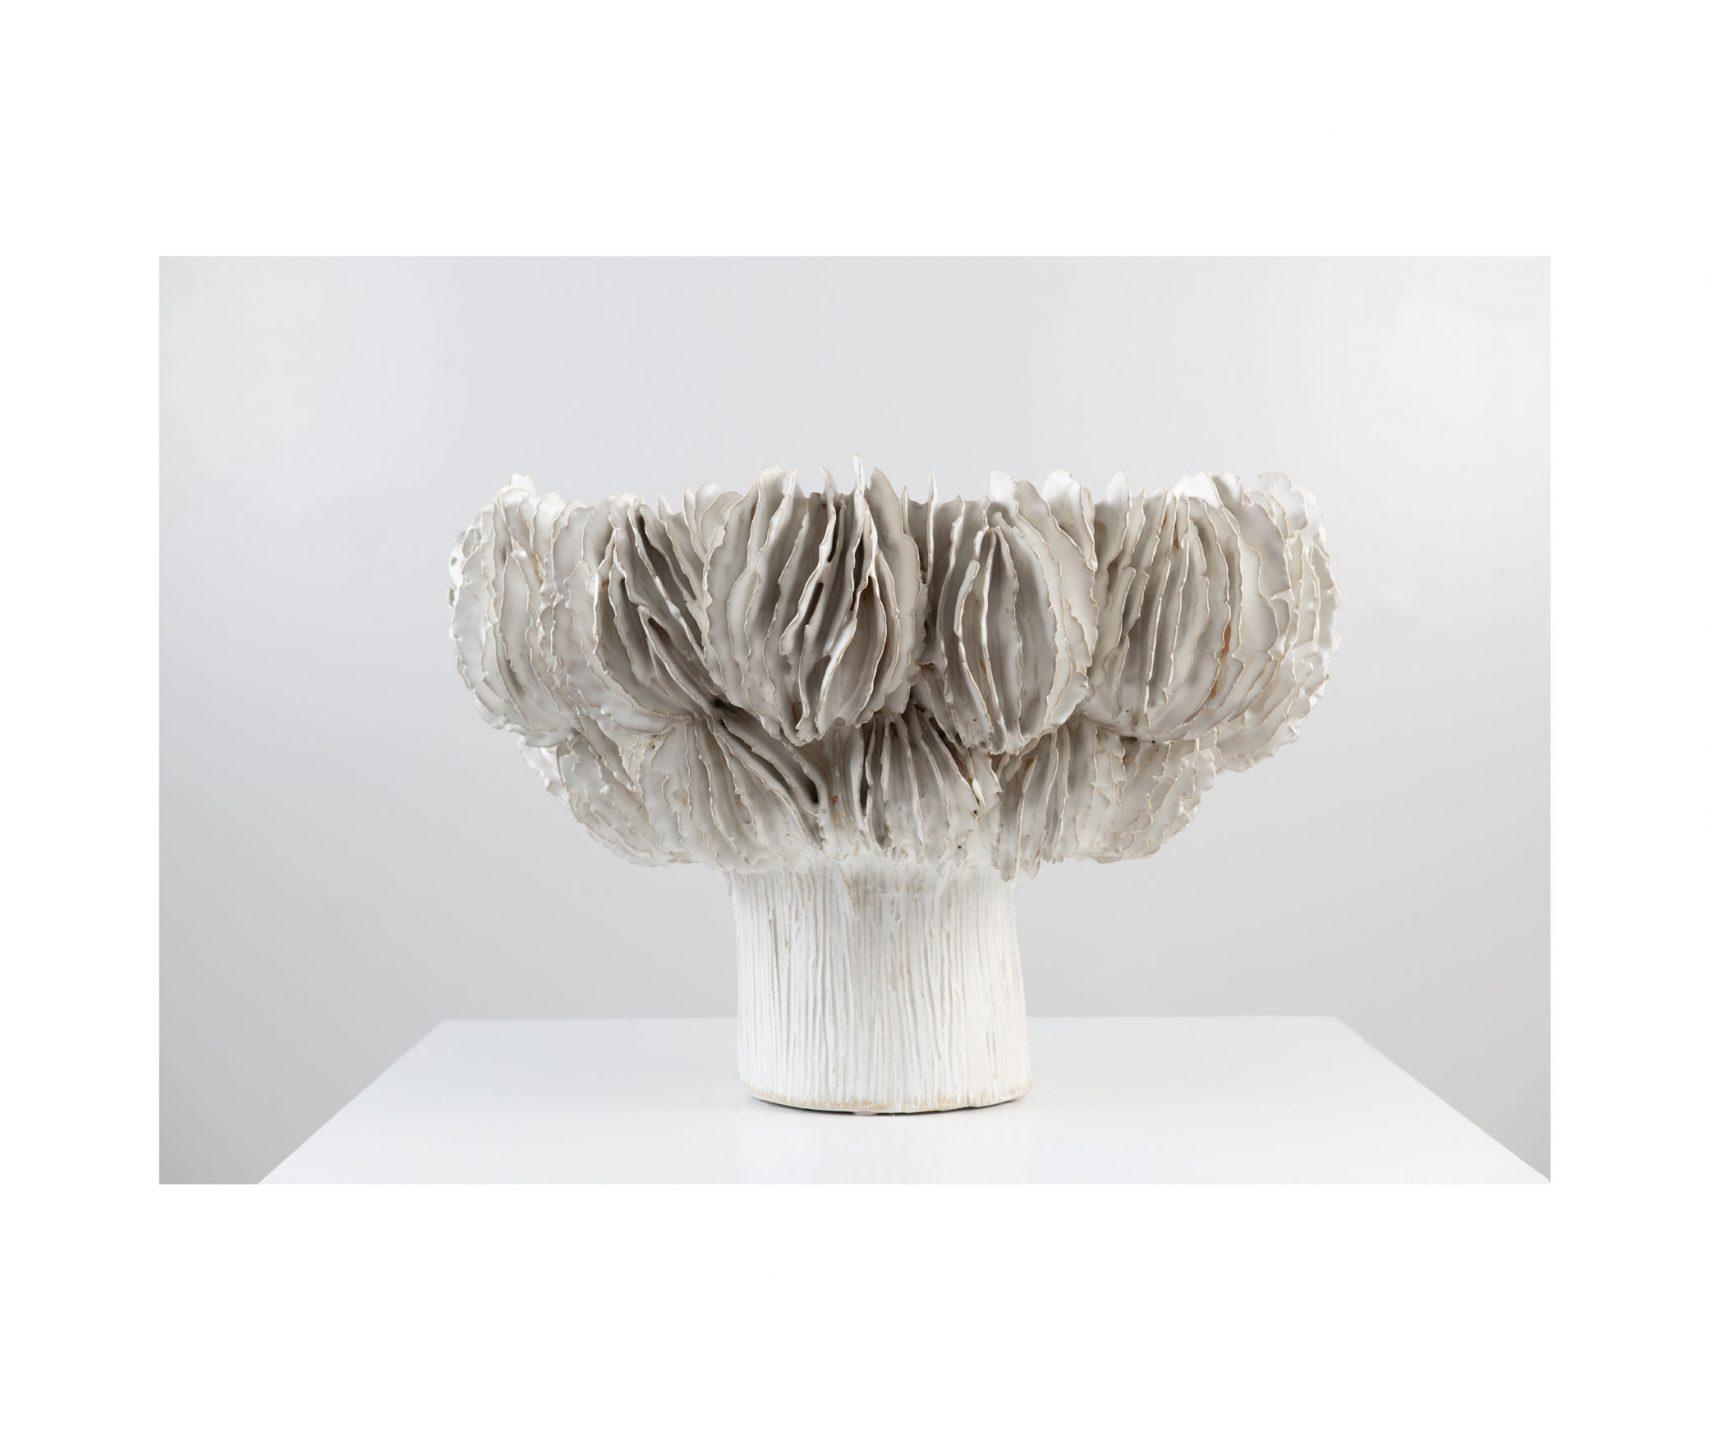 Wexler_Lamella-Pedestal-Bowl-2_int_products